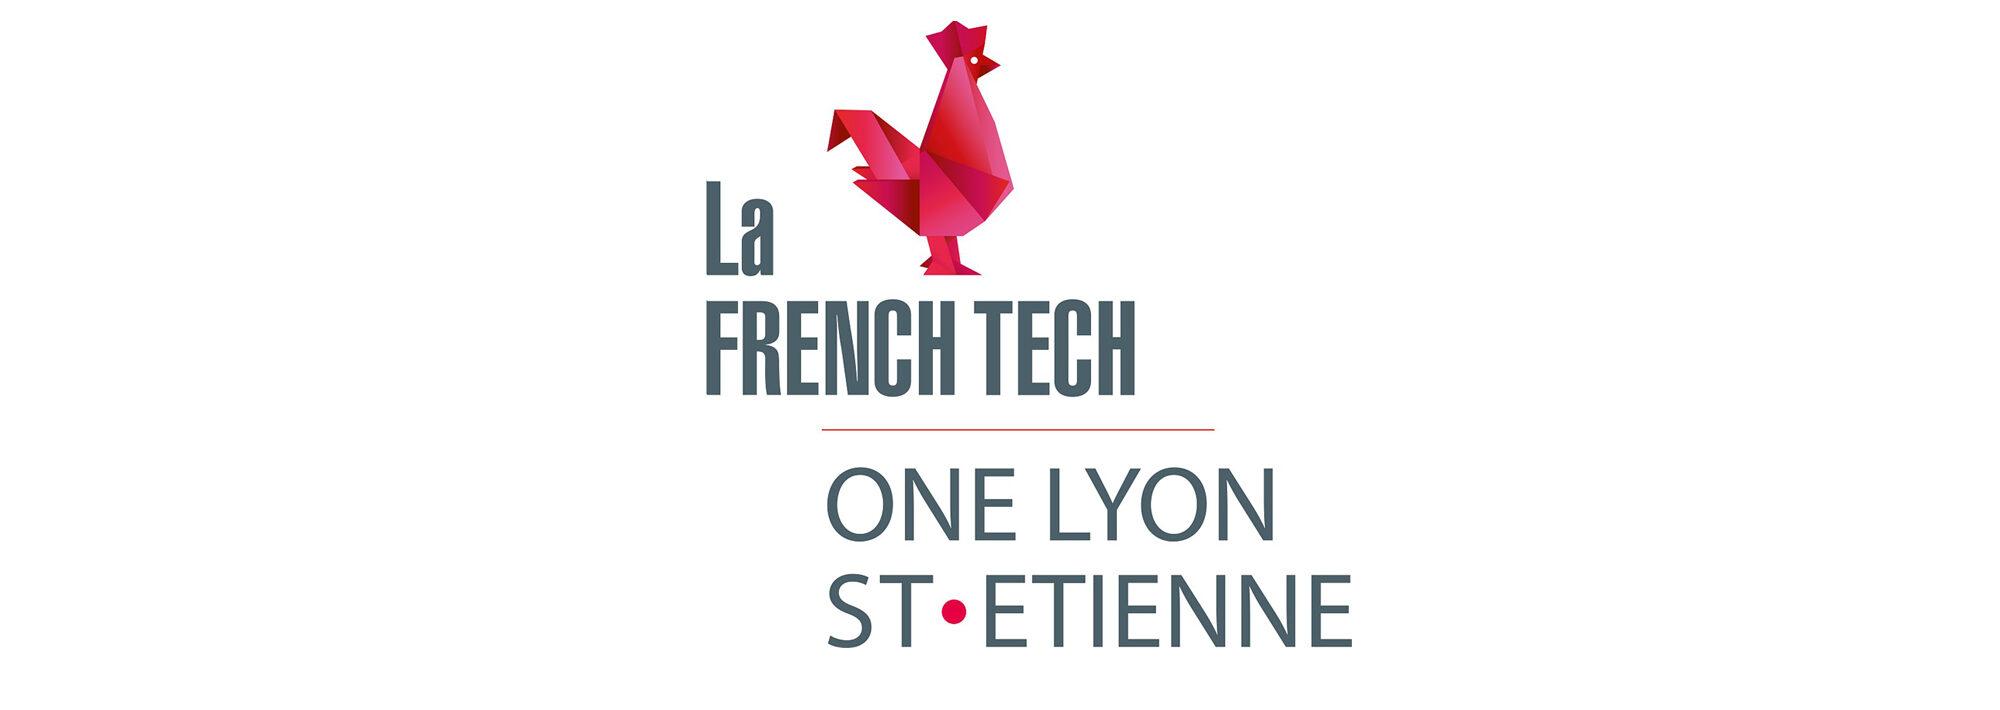 French Tech One Lyon Saint-Etienne